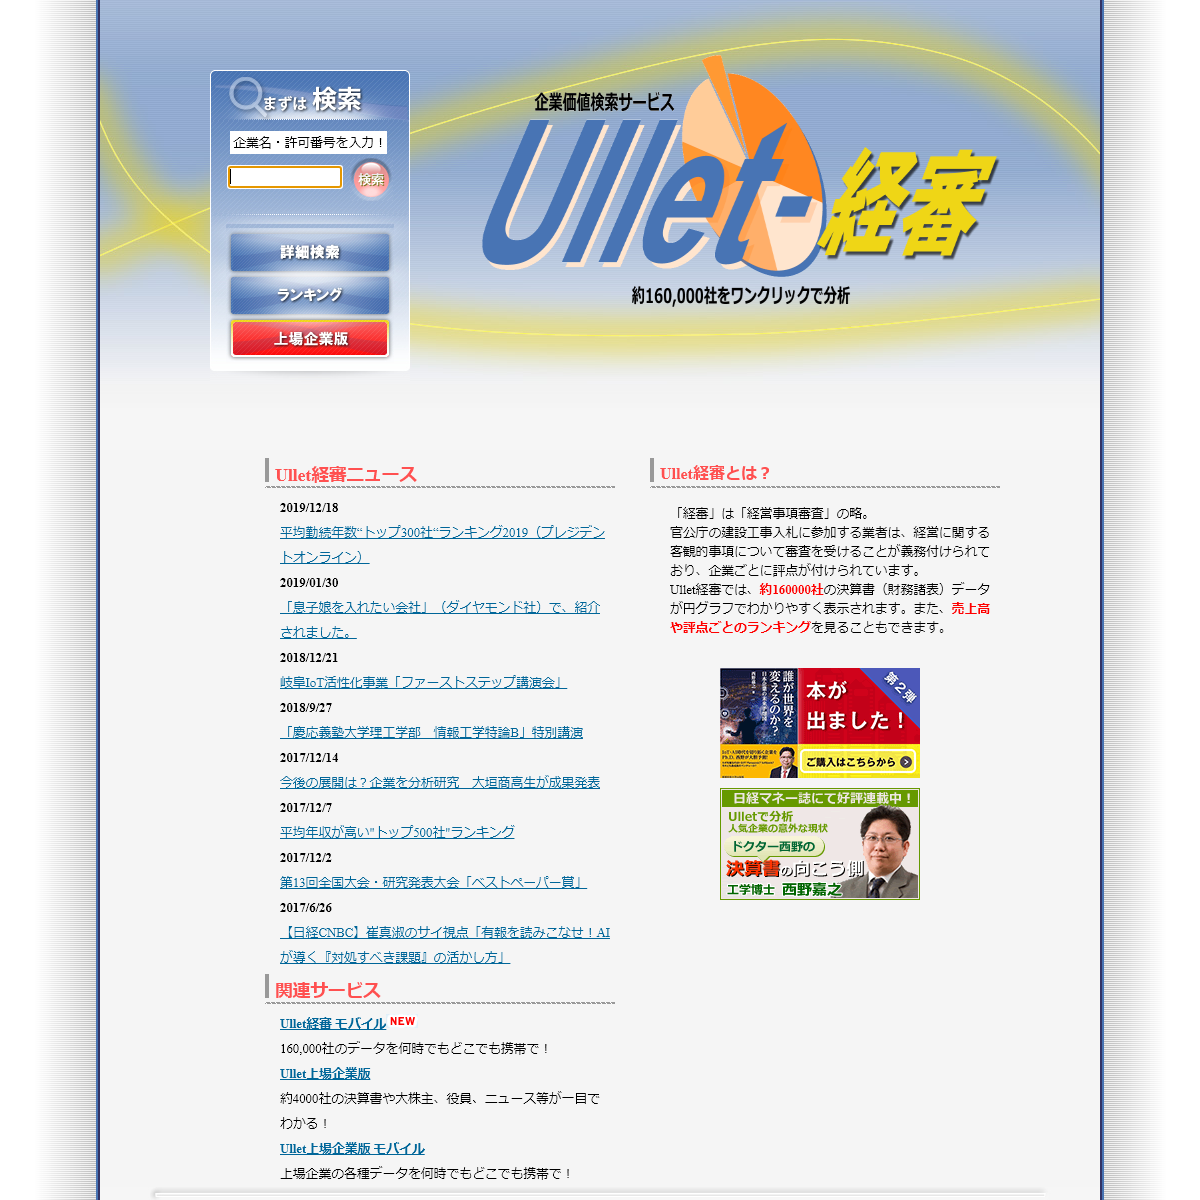 Ullet(ユーレット)経審